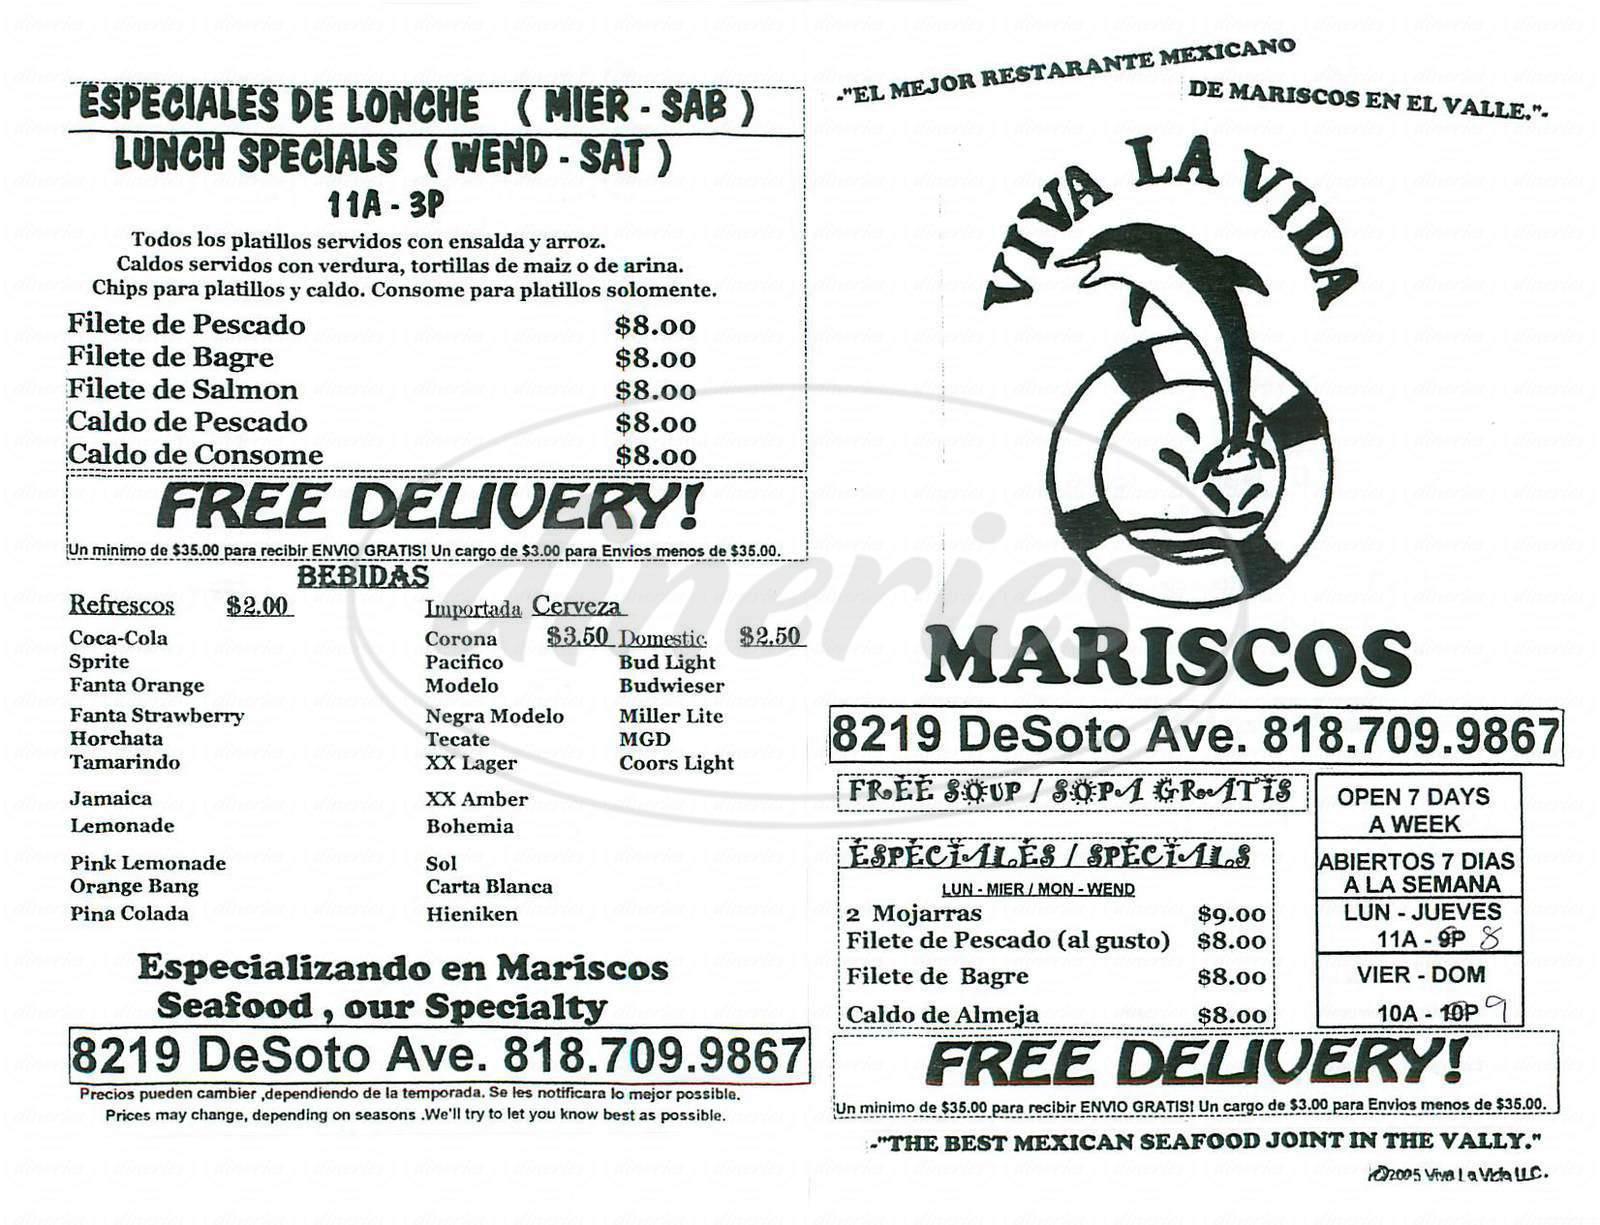 menu for Viva la Vida Mariscos